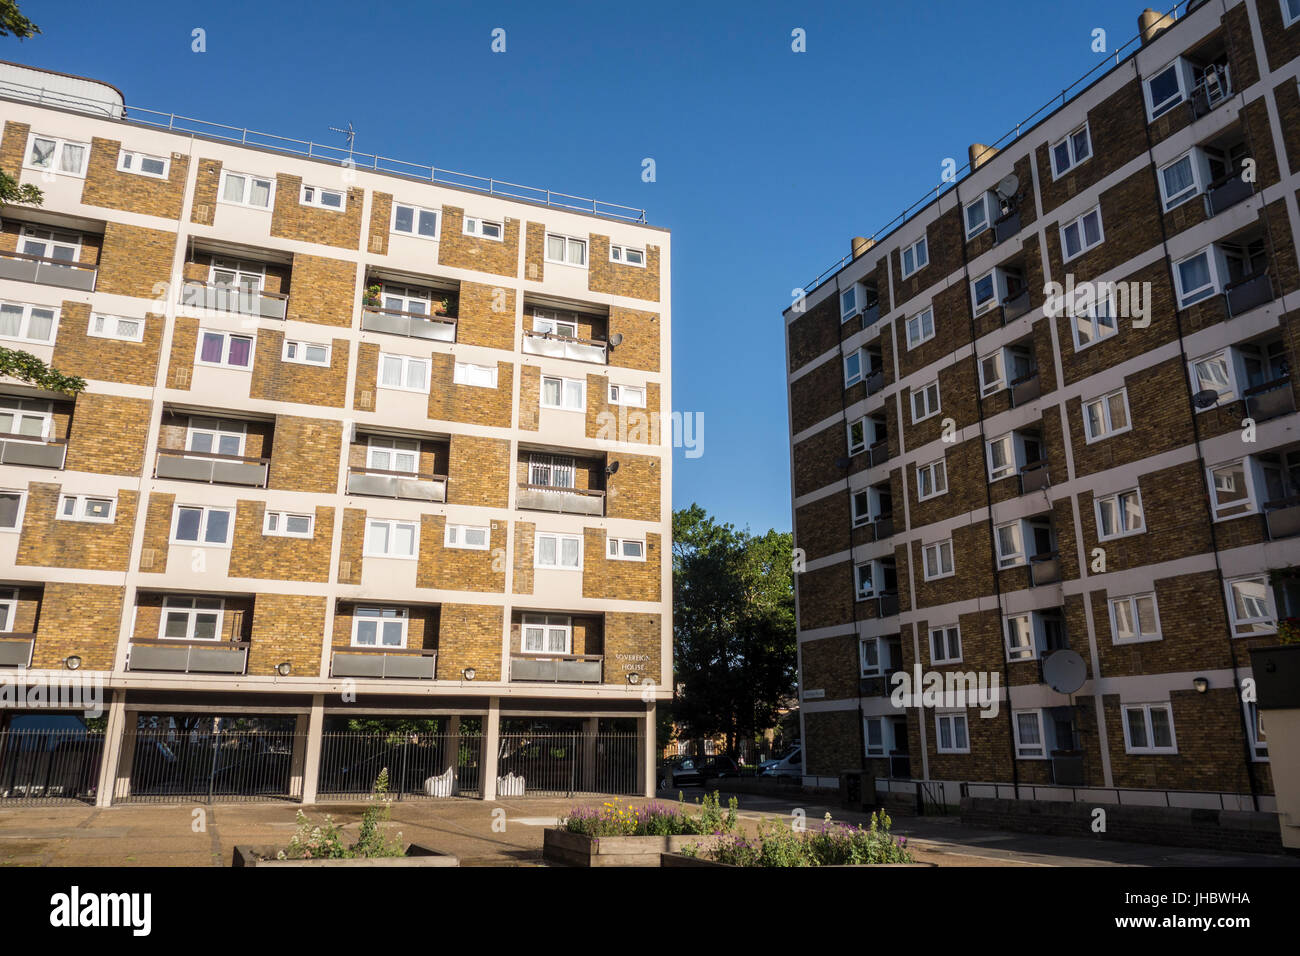 Social housing in Globe Town, Cambridge Heath Road, Bethnal Green, Tower Hamlets, East London, UK - Stock Image